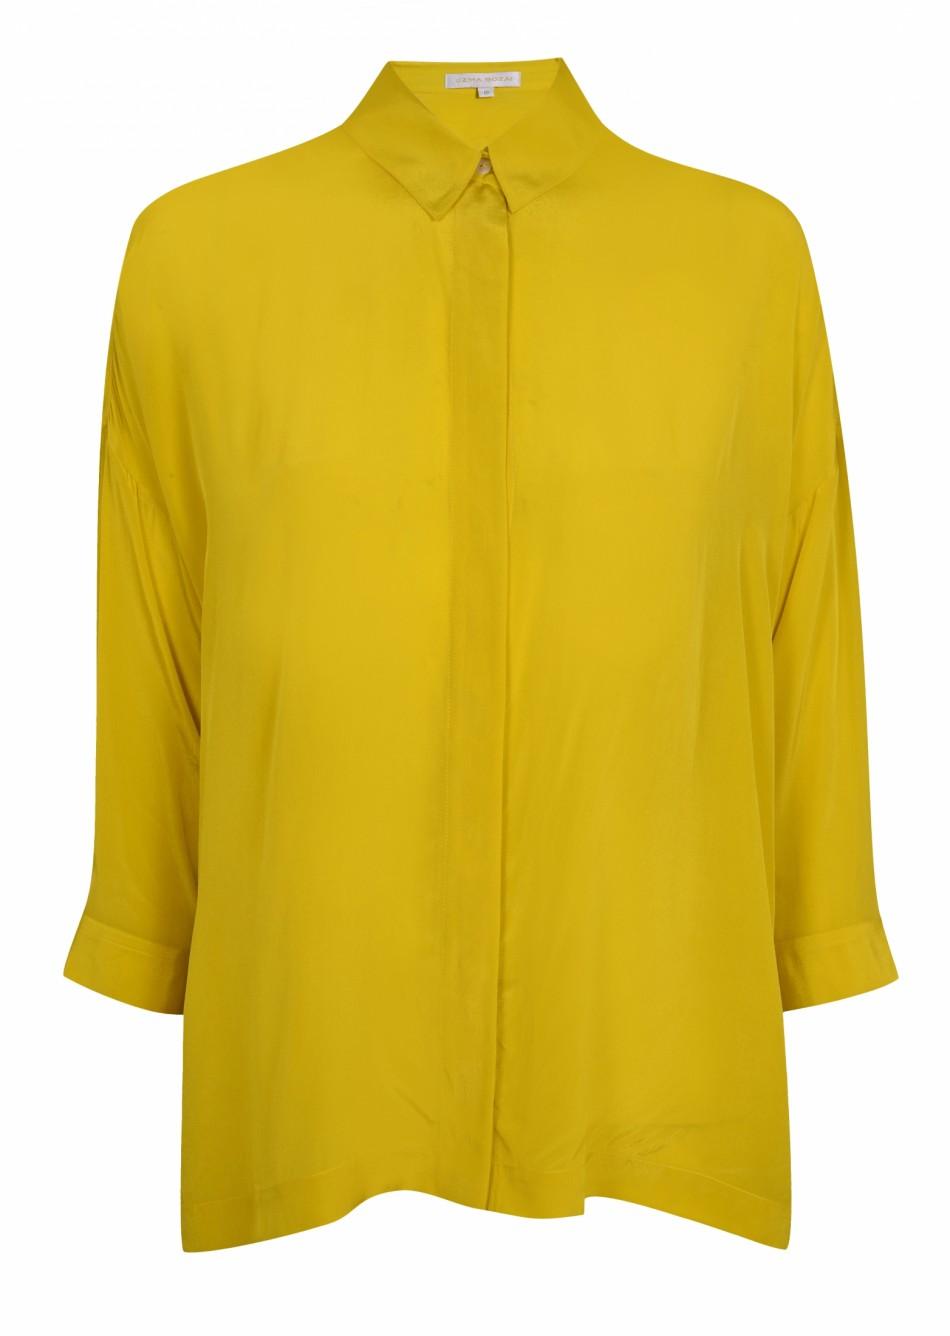 Malih Shirt - Tarragon Viscose